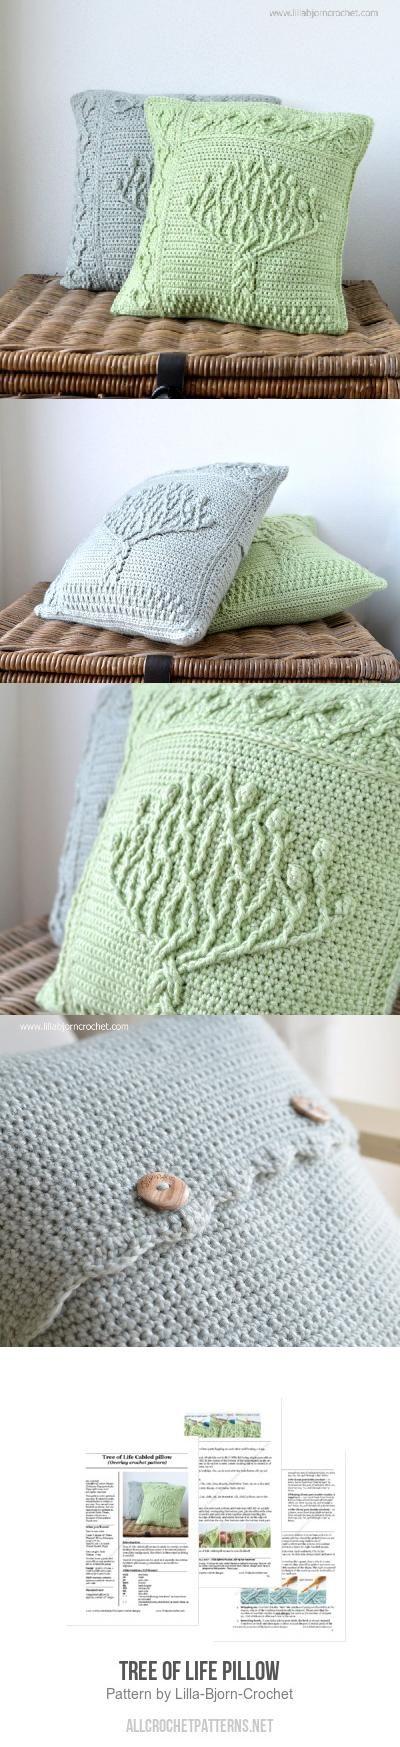 Tree of Life Pillow crochet pattern by Lilla Bjorn Crochet   Pillows